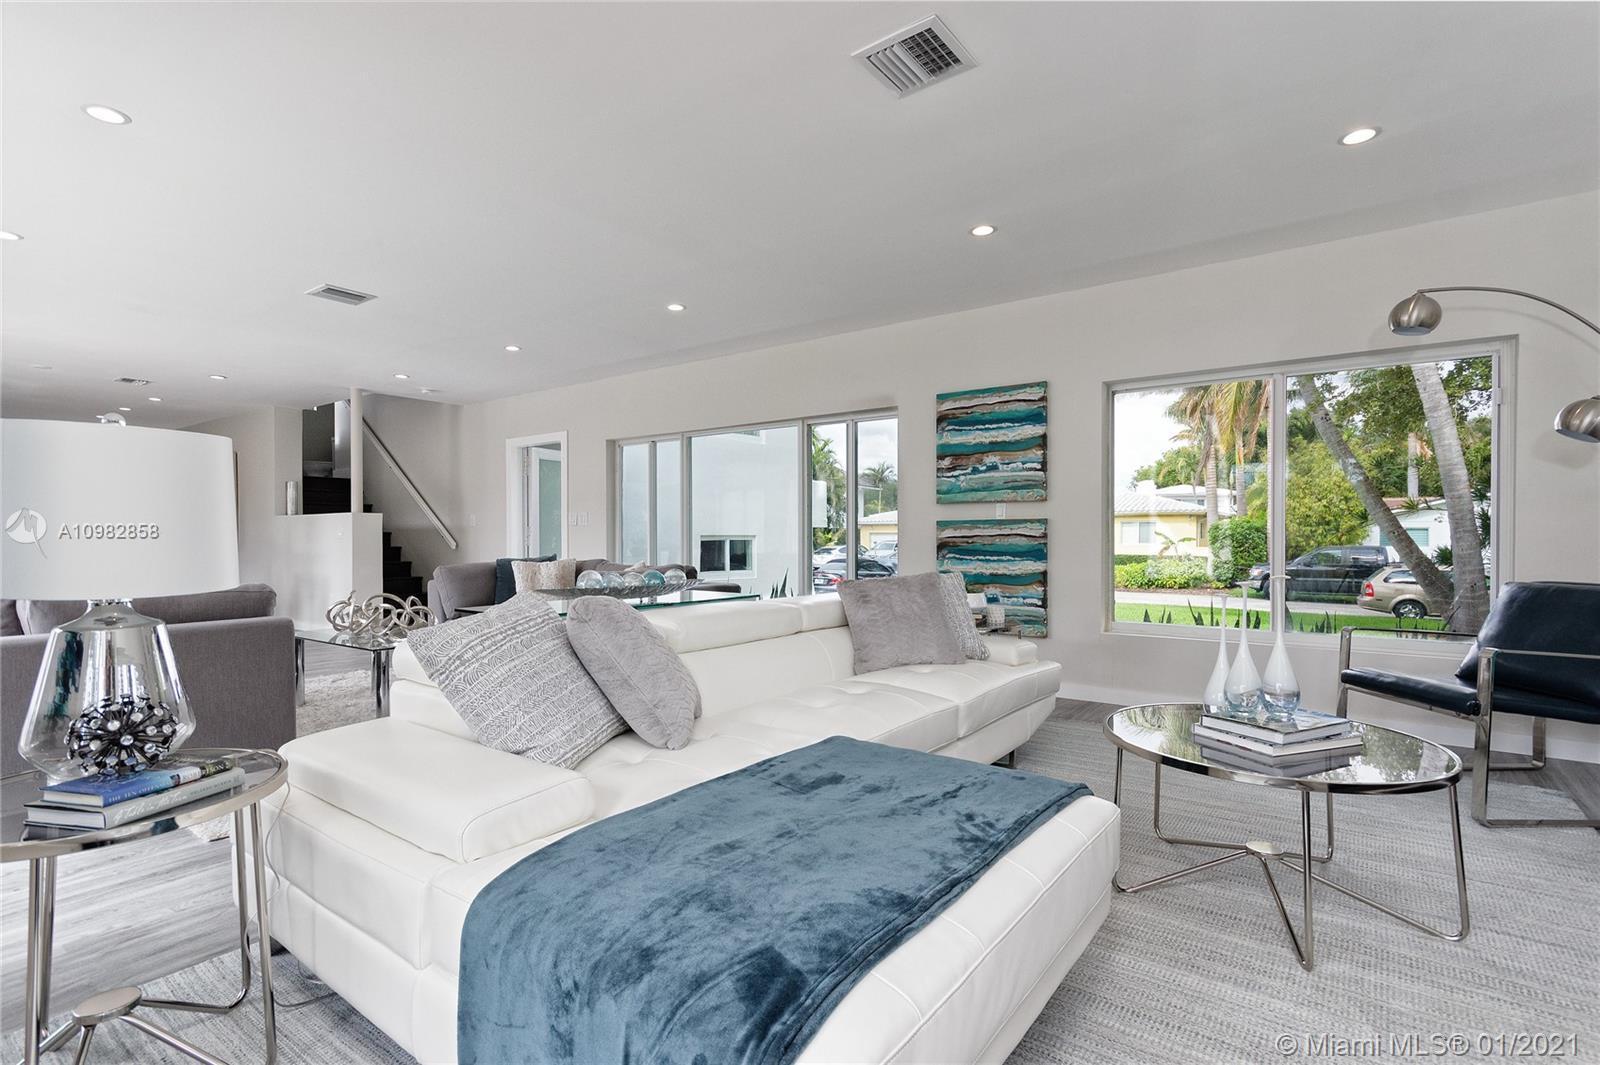 Miami Shores # - 03 - photo